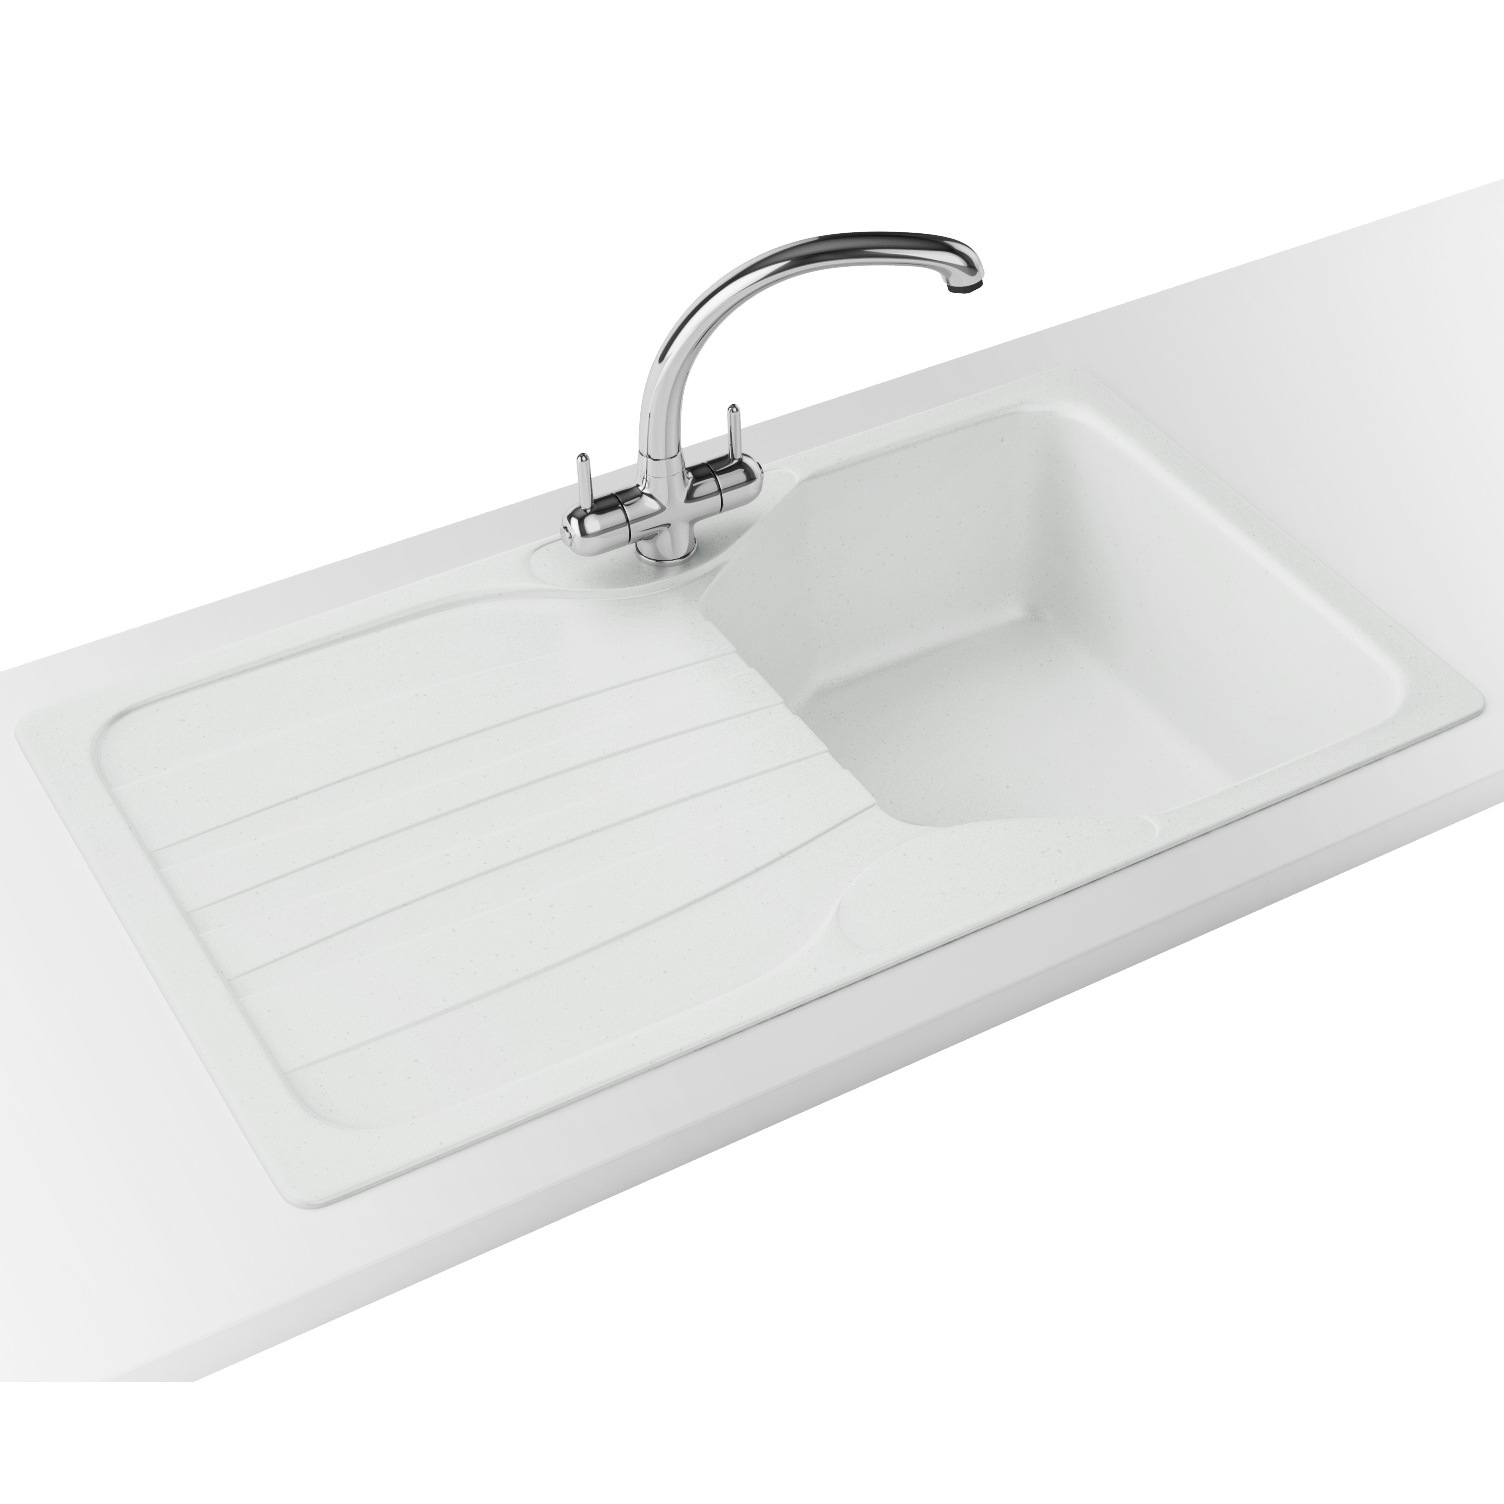 franke calypso cog 611 polar white 10 bowl kitchen inset sink - Franke Sink